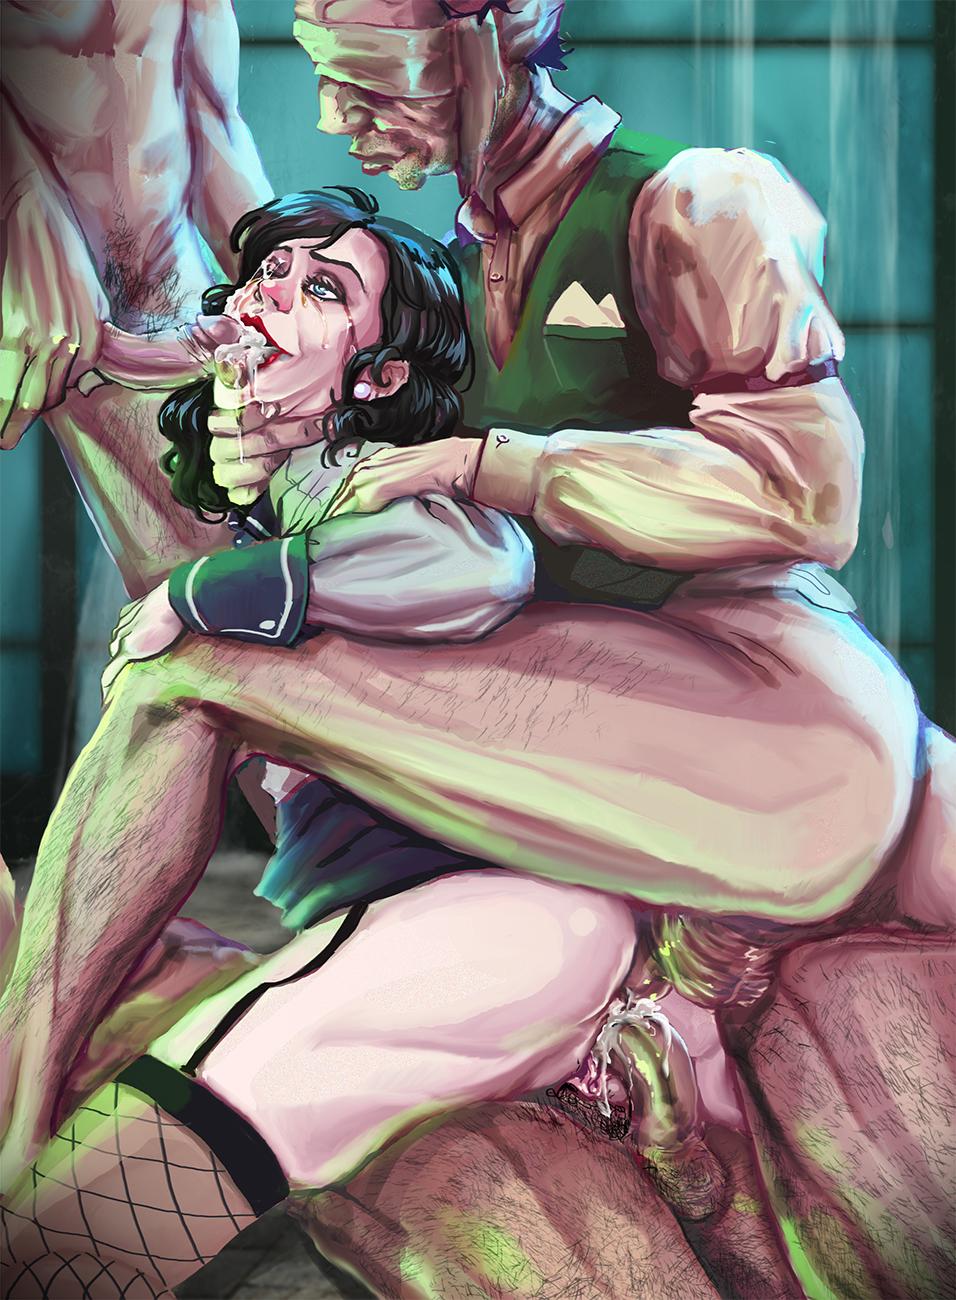 is how elizabeth infinite in bioshock old Scooby doo velma scooby nude